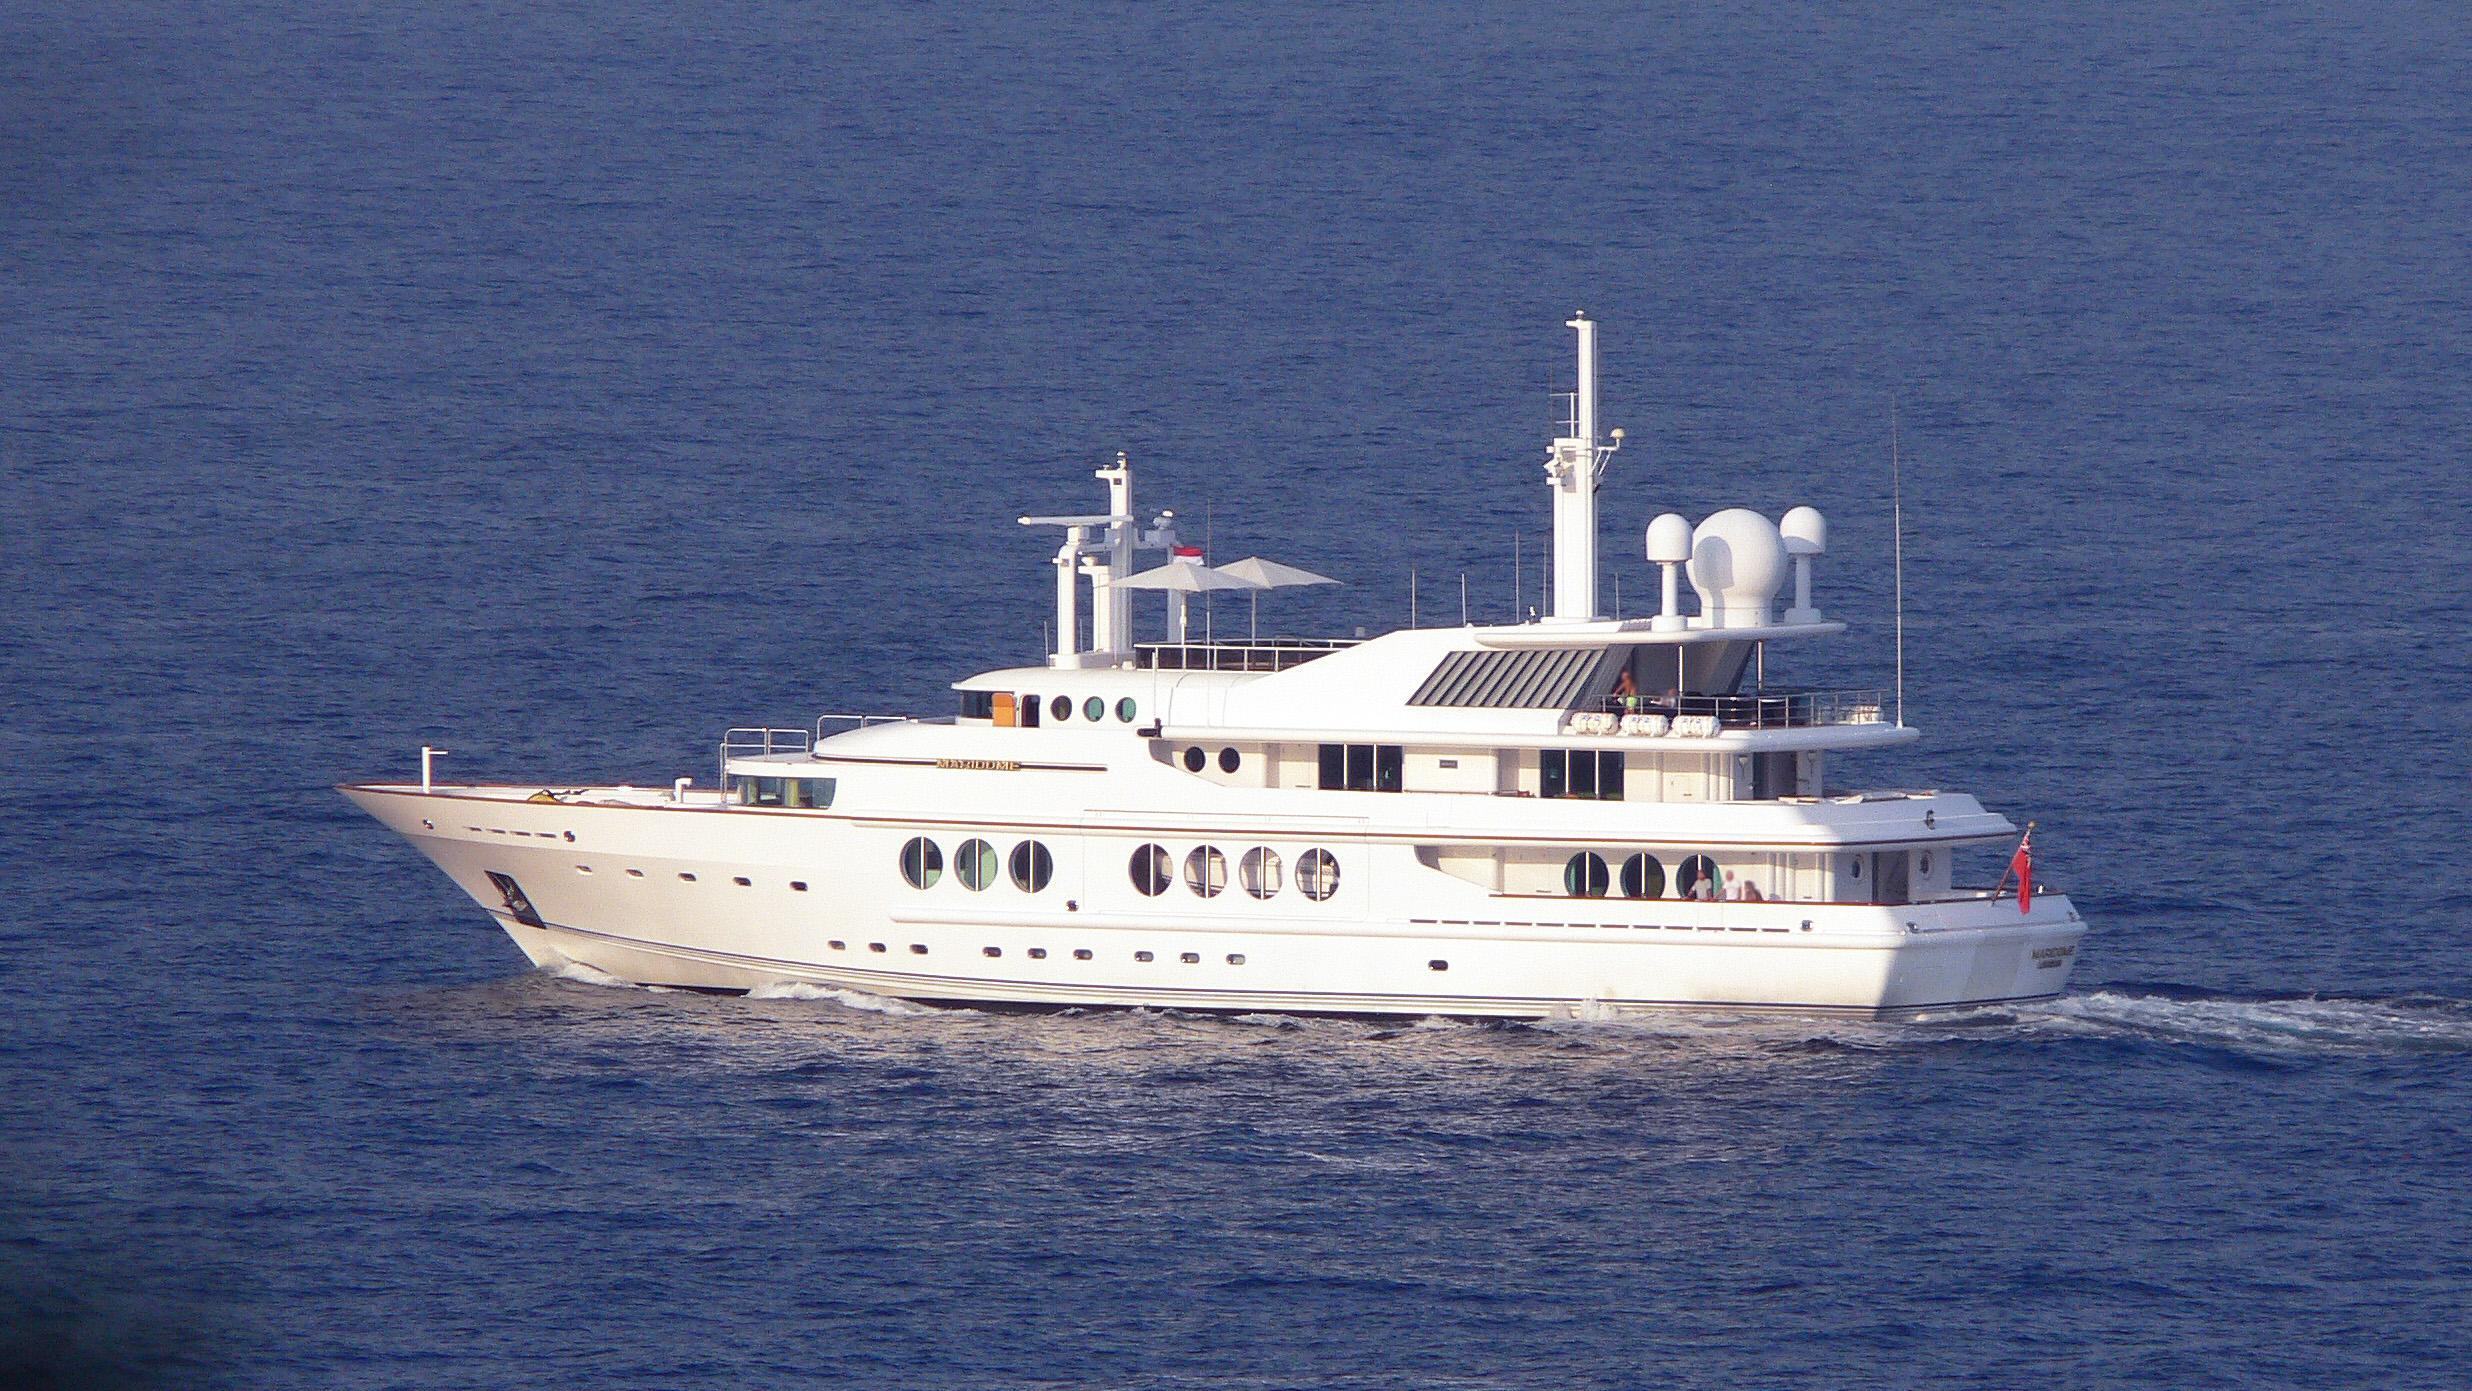 maridome-motor-yacht-brooke-1989-54m-cruising-half-profile